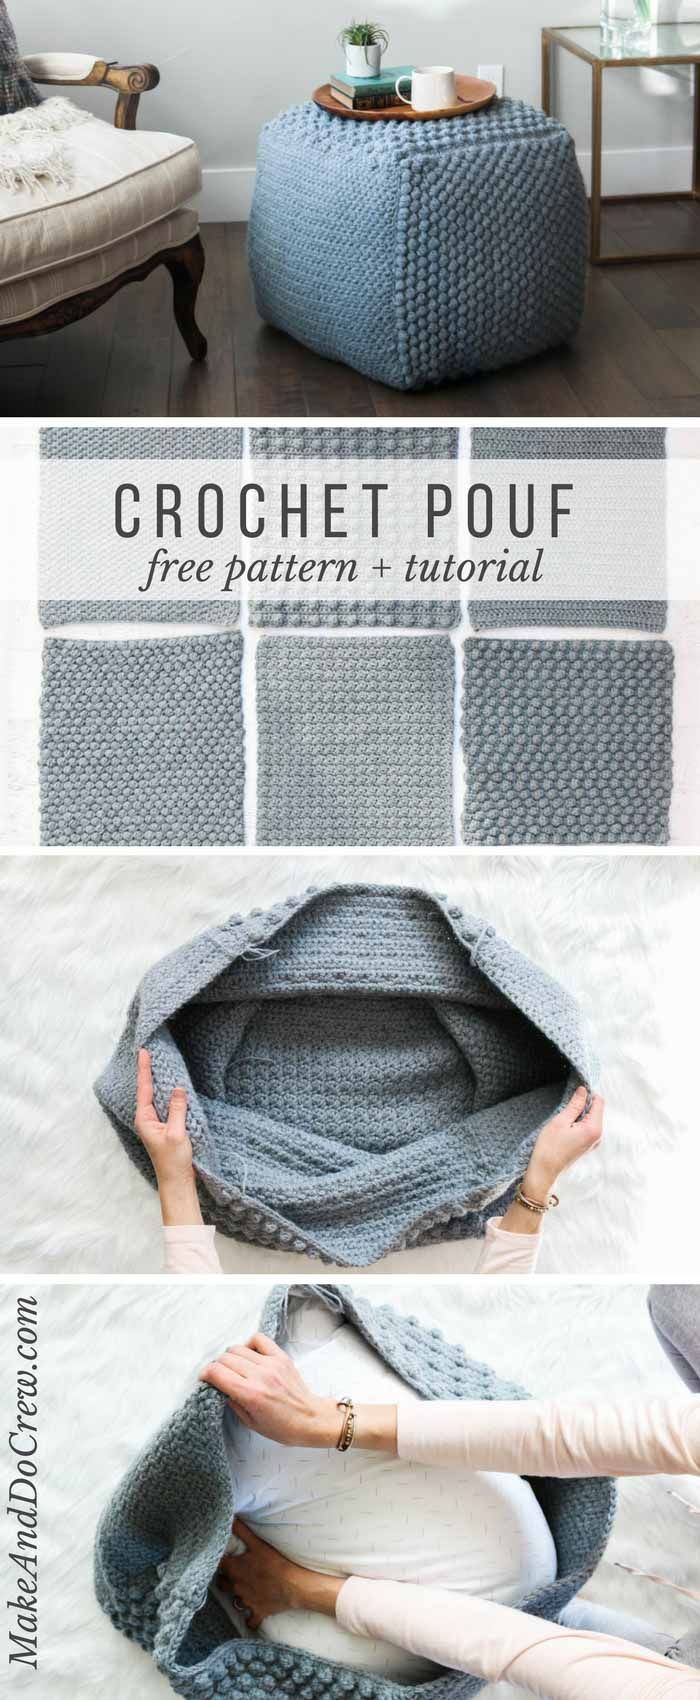 Free Crochet Pouf Pattern - modern, textured + economical! #crochetsweaterpatternwomen